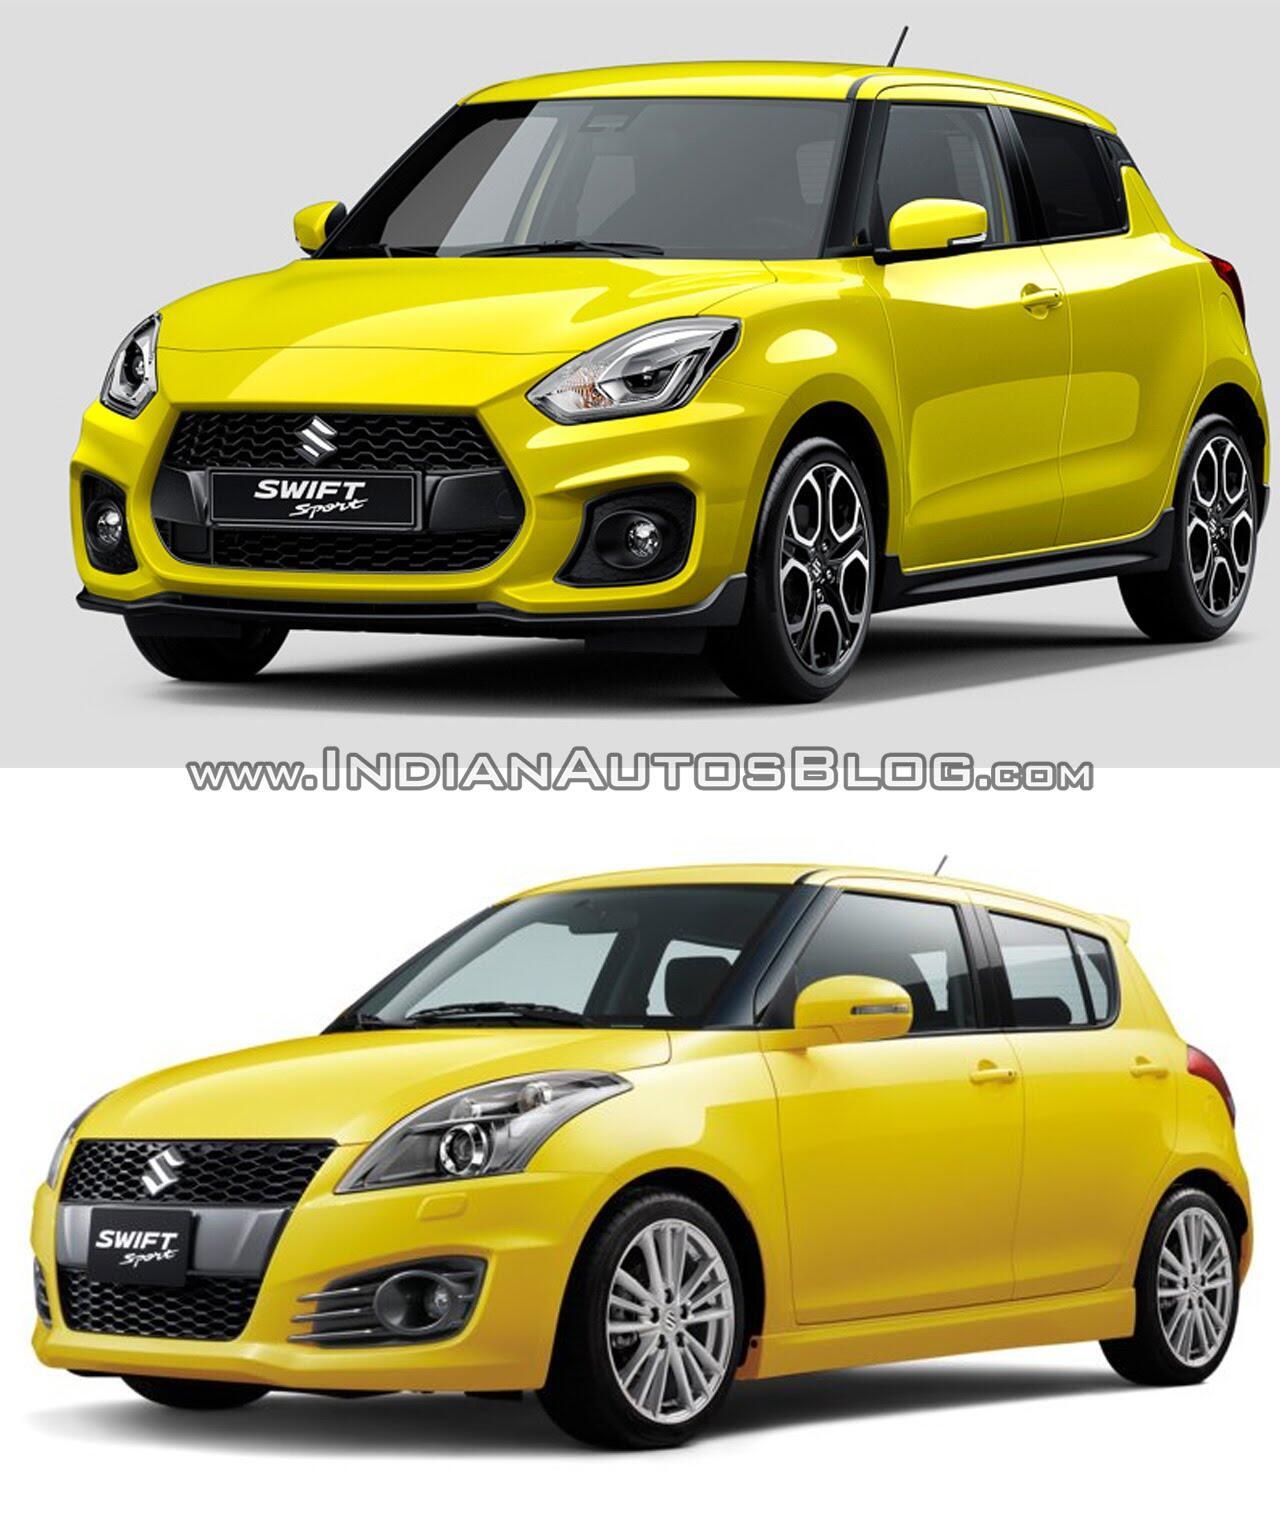 Suzuki Swift Sport mới lộ diện ảnh đầu tiên - Hình 3